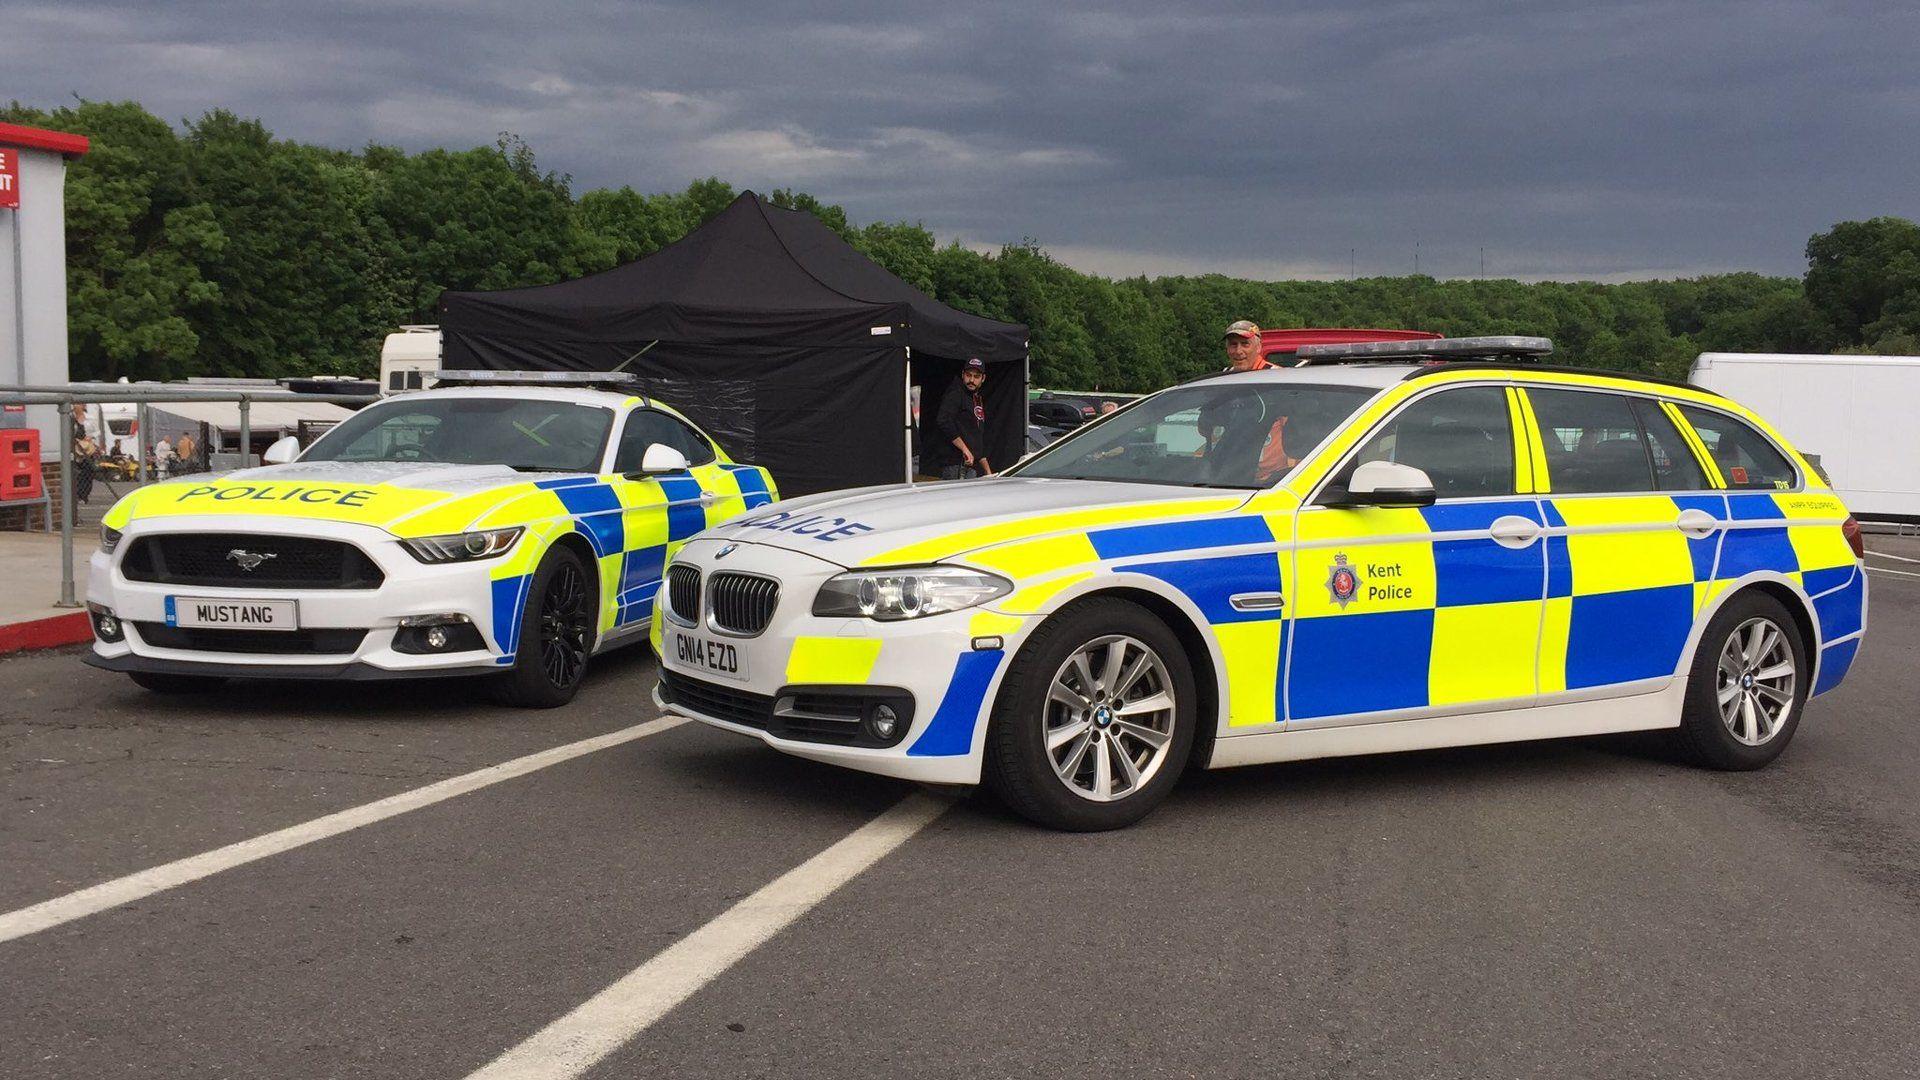 Pin By Vehicle Hazard Lighting Soluti On Police Vehicles Police Cars British Police Cars Ford Mustang Uk